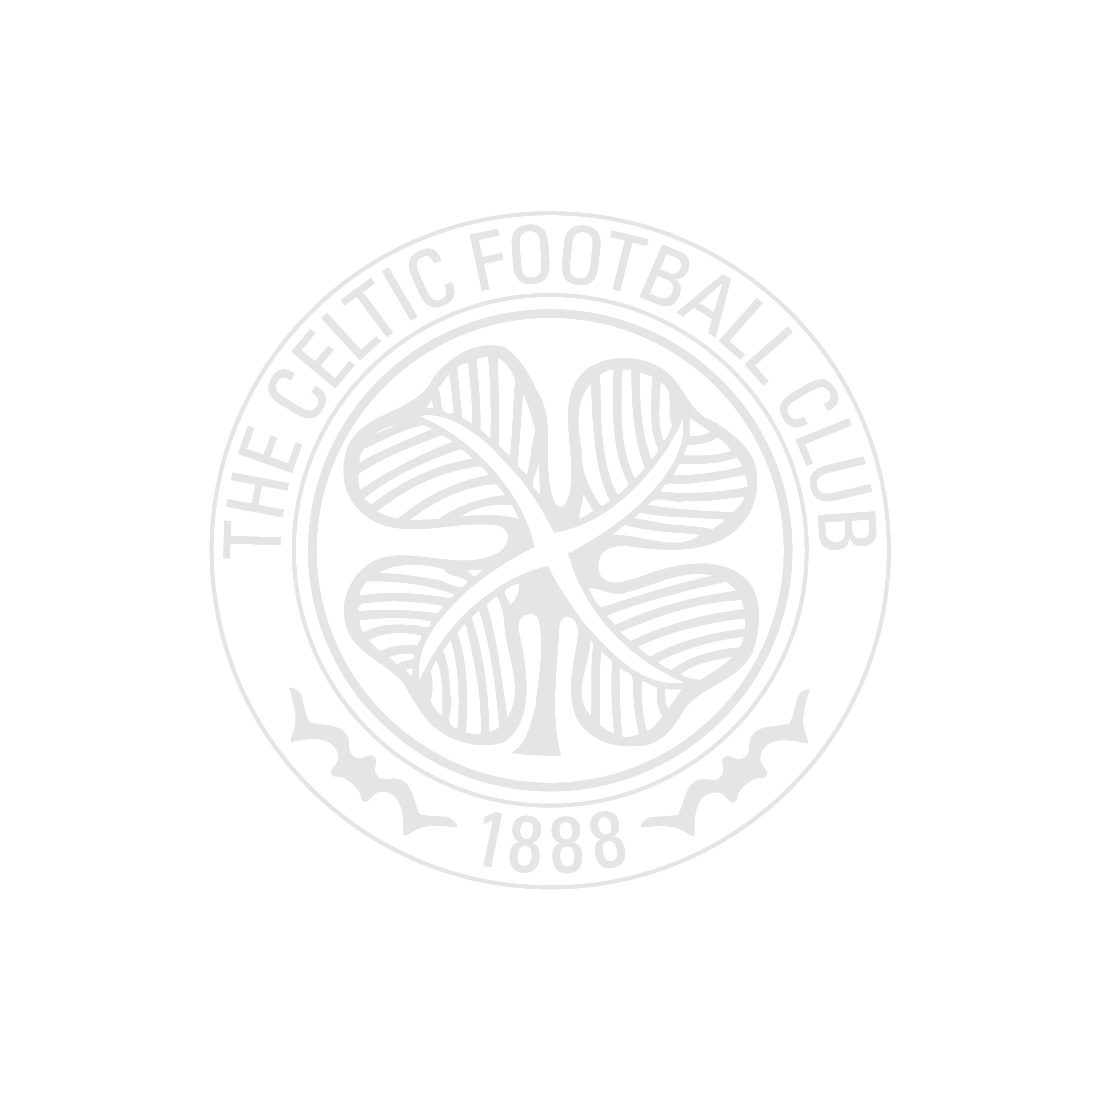 Celtic Mens Third Shirt 18/19 with Sponsor Back